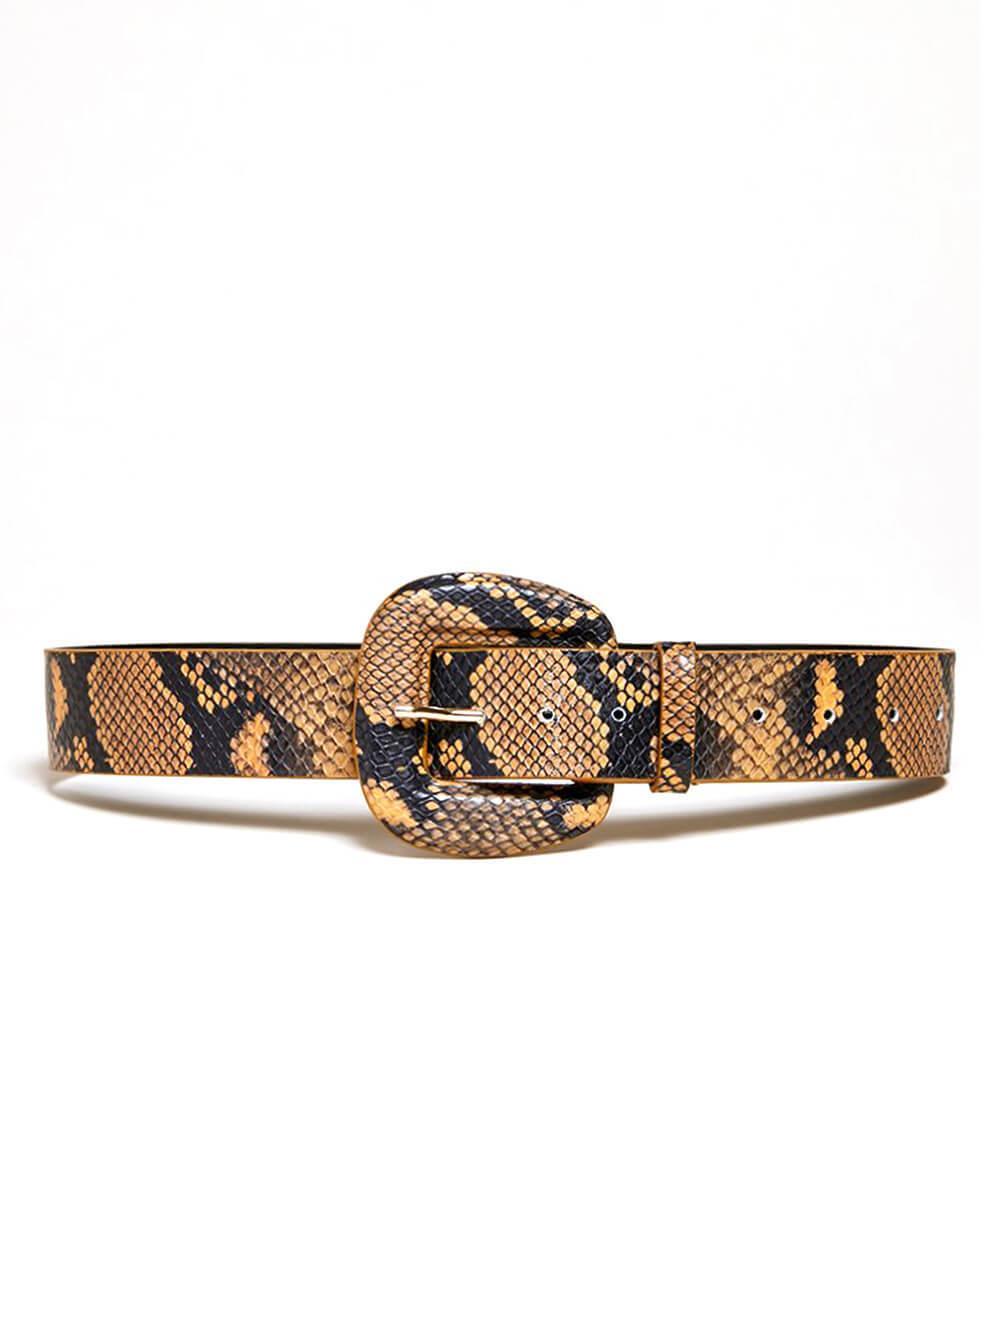 Emsy Belt Item # B200801ES